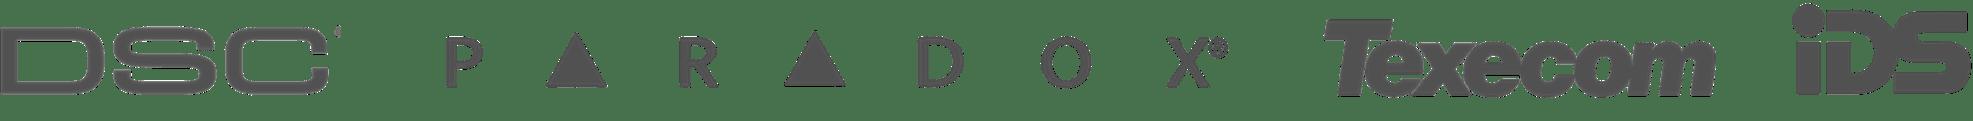 Alarm integration logos